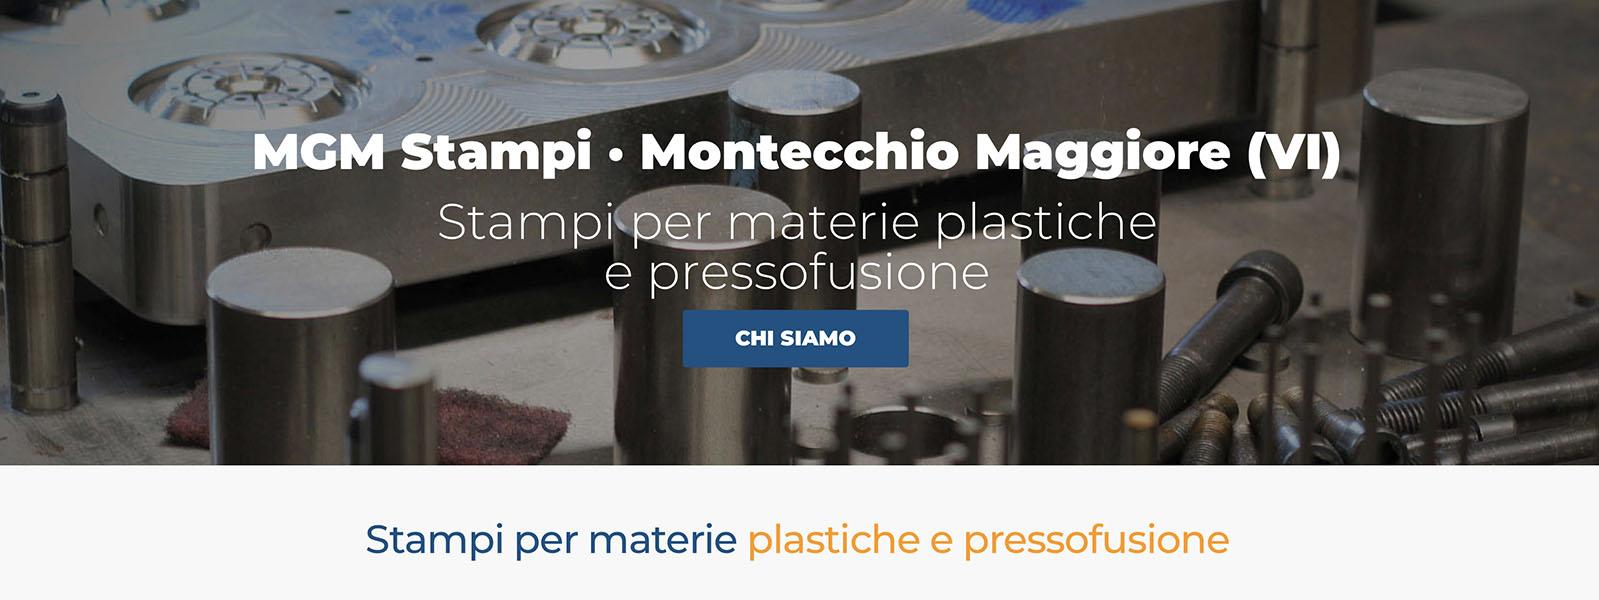 Sito Web MGM Stampi Schiavo